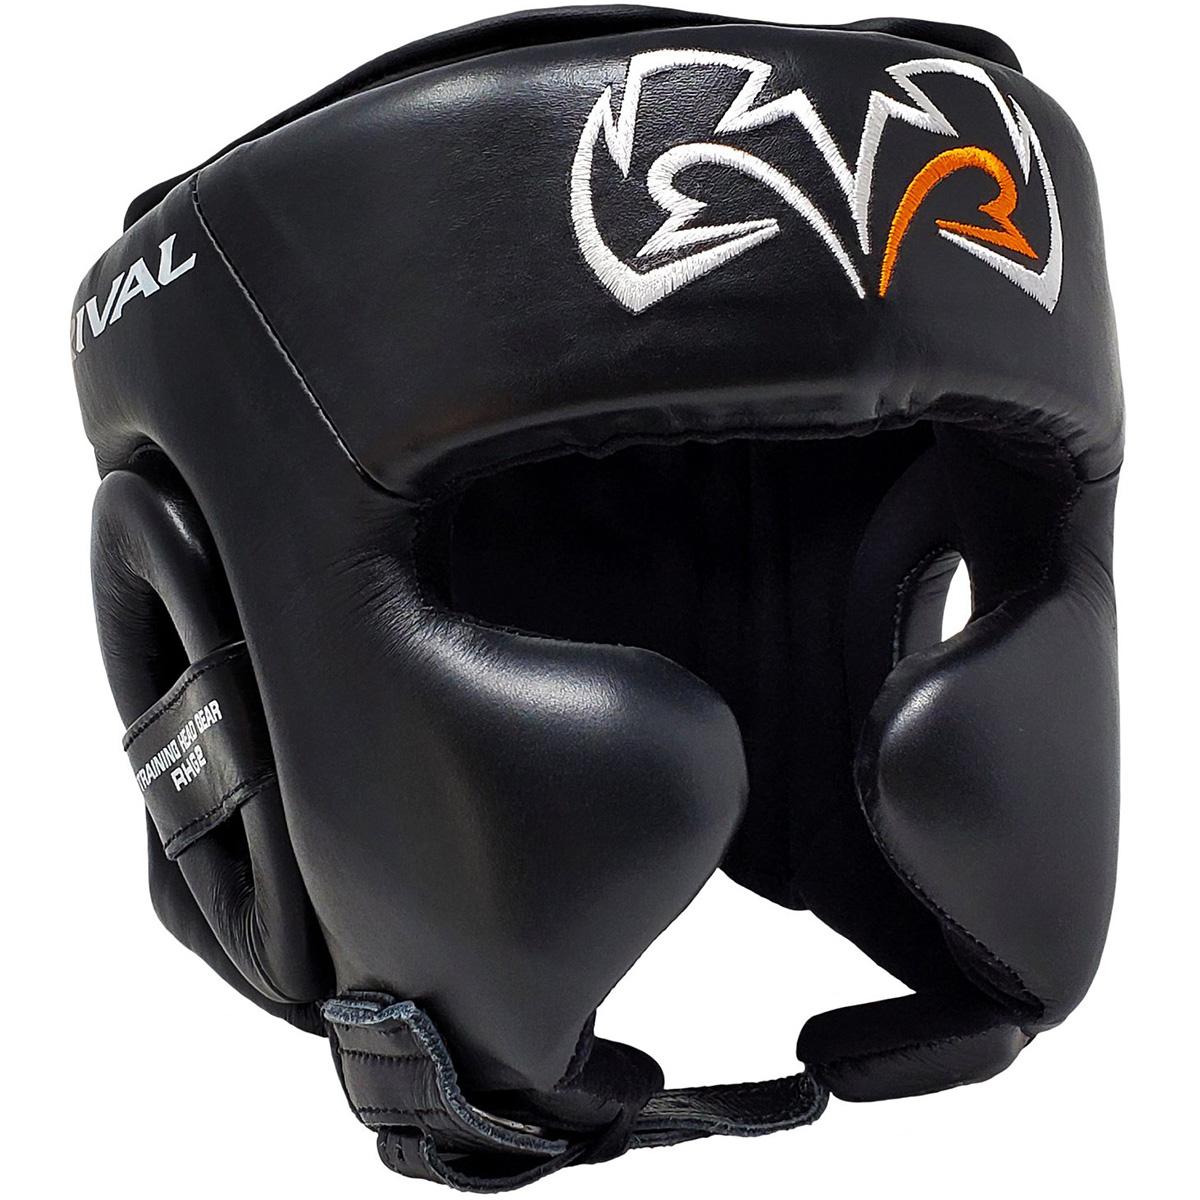 thumbnail 4 - RIVAL Boxing RHG2 Training Headgear